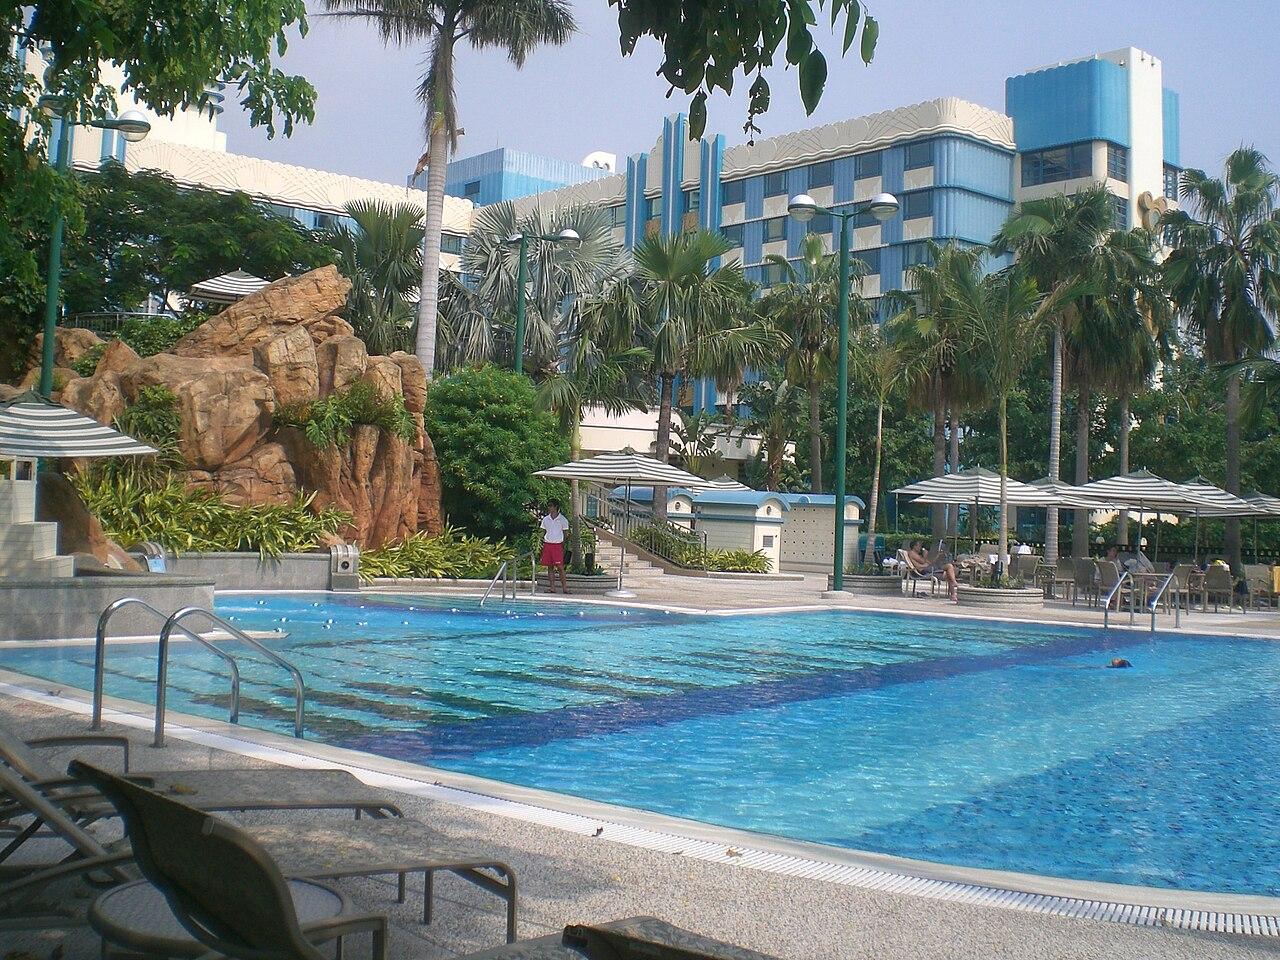 File Hk Disney 39 S Hollywood Hotel Swimming Pool 01 Jpg Wikimedia Commons